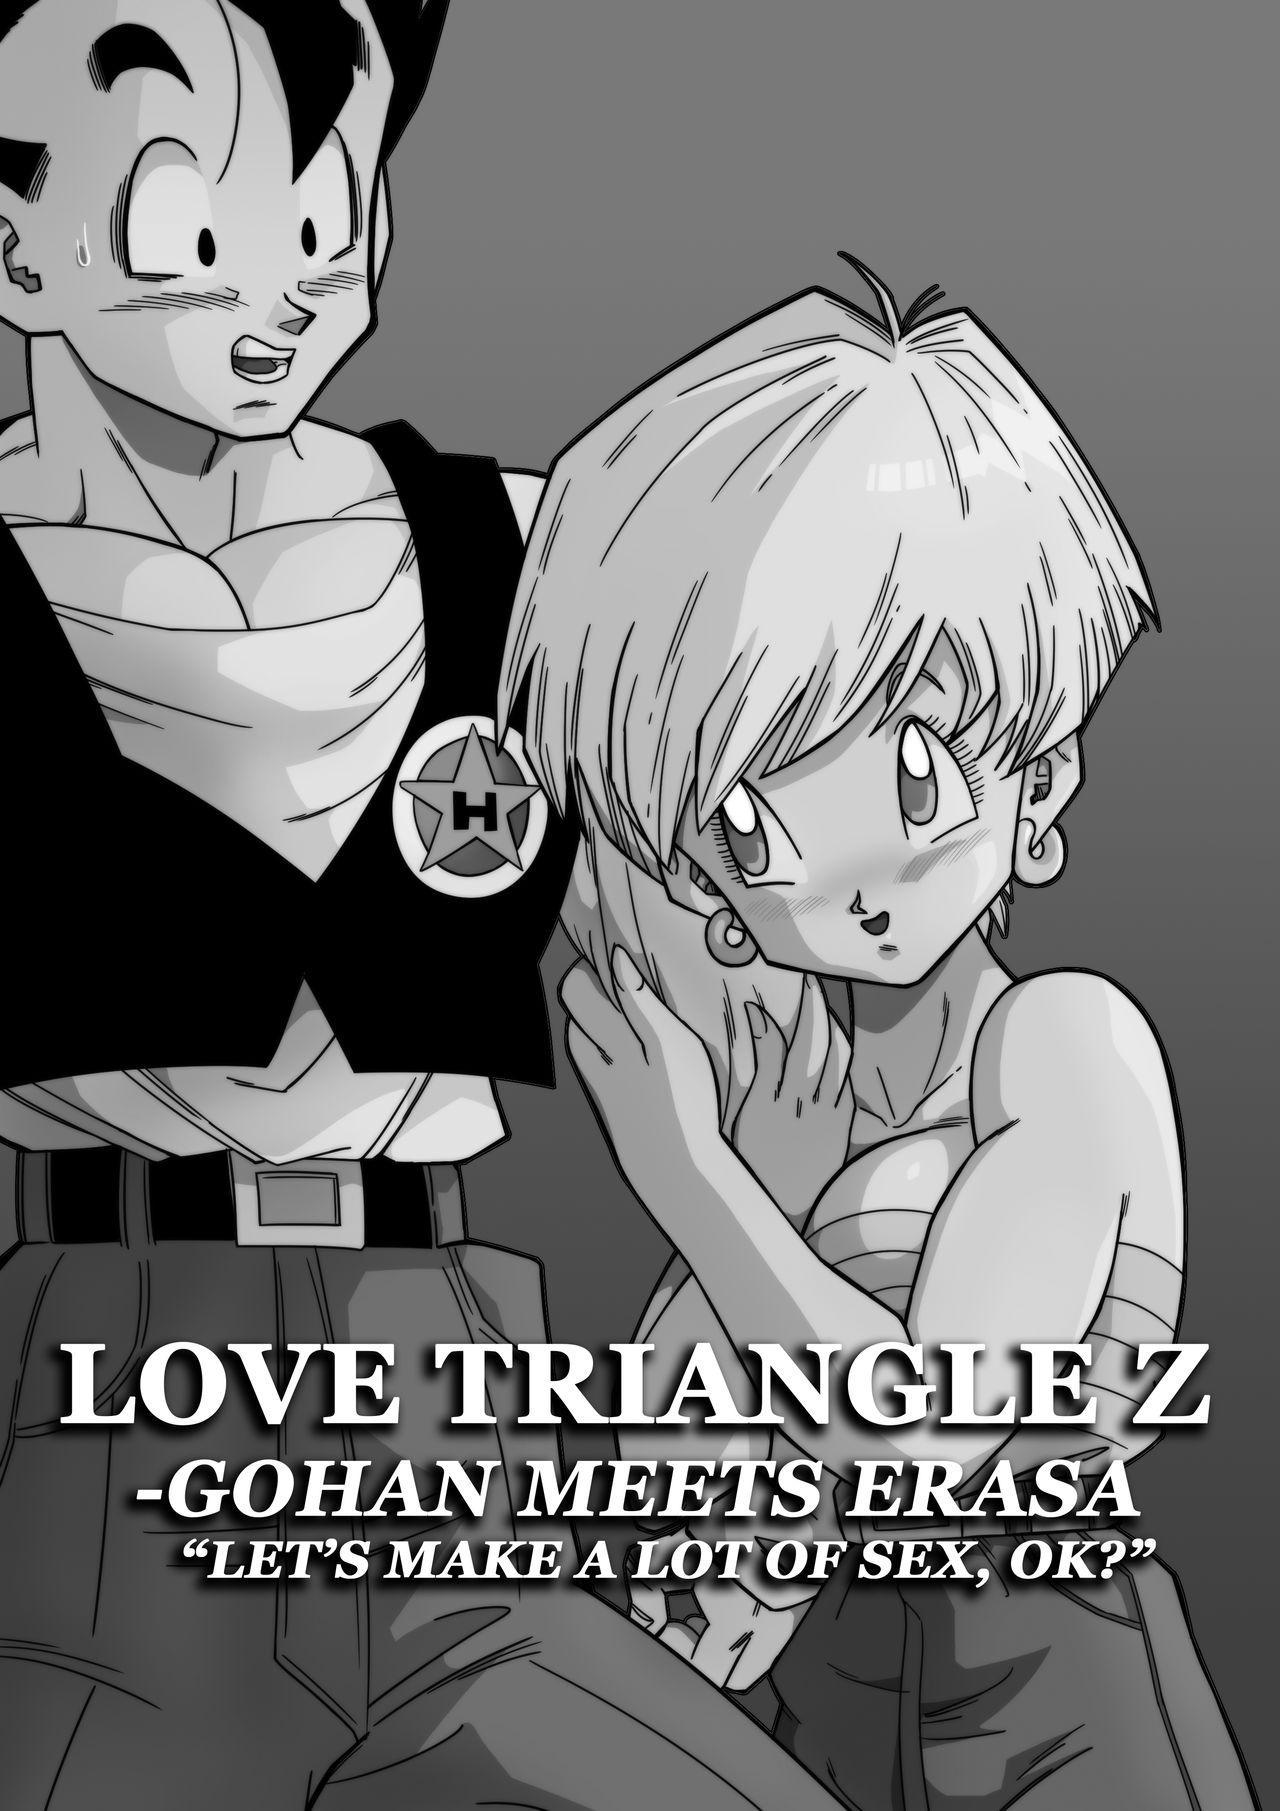 LOVE TRIANGLE Z - Gohan, Erasa to Deau 1